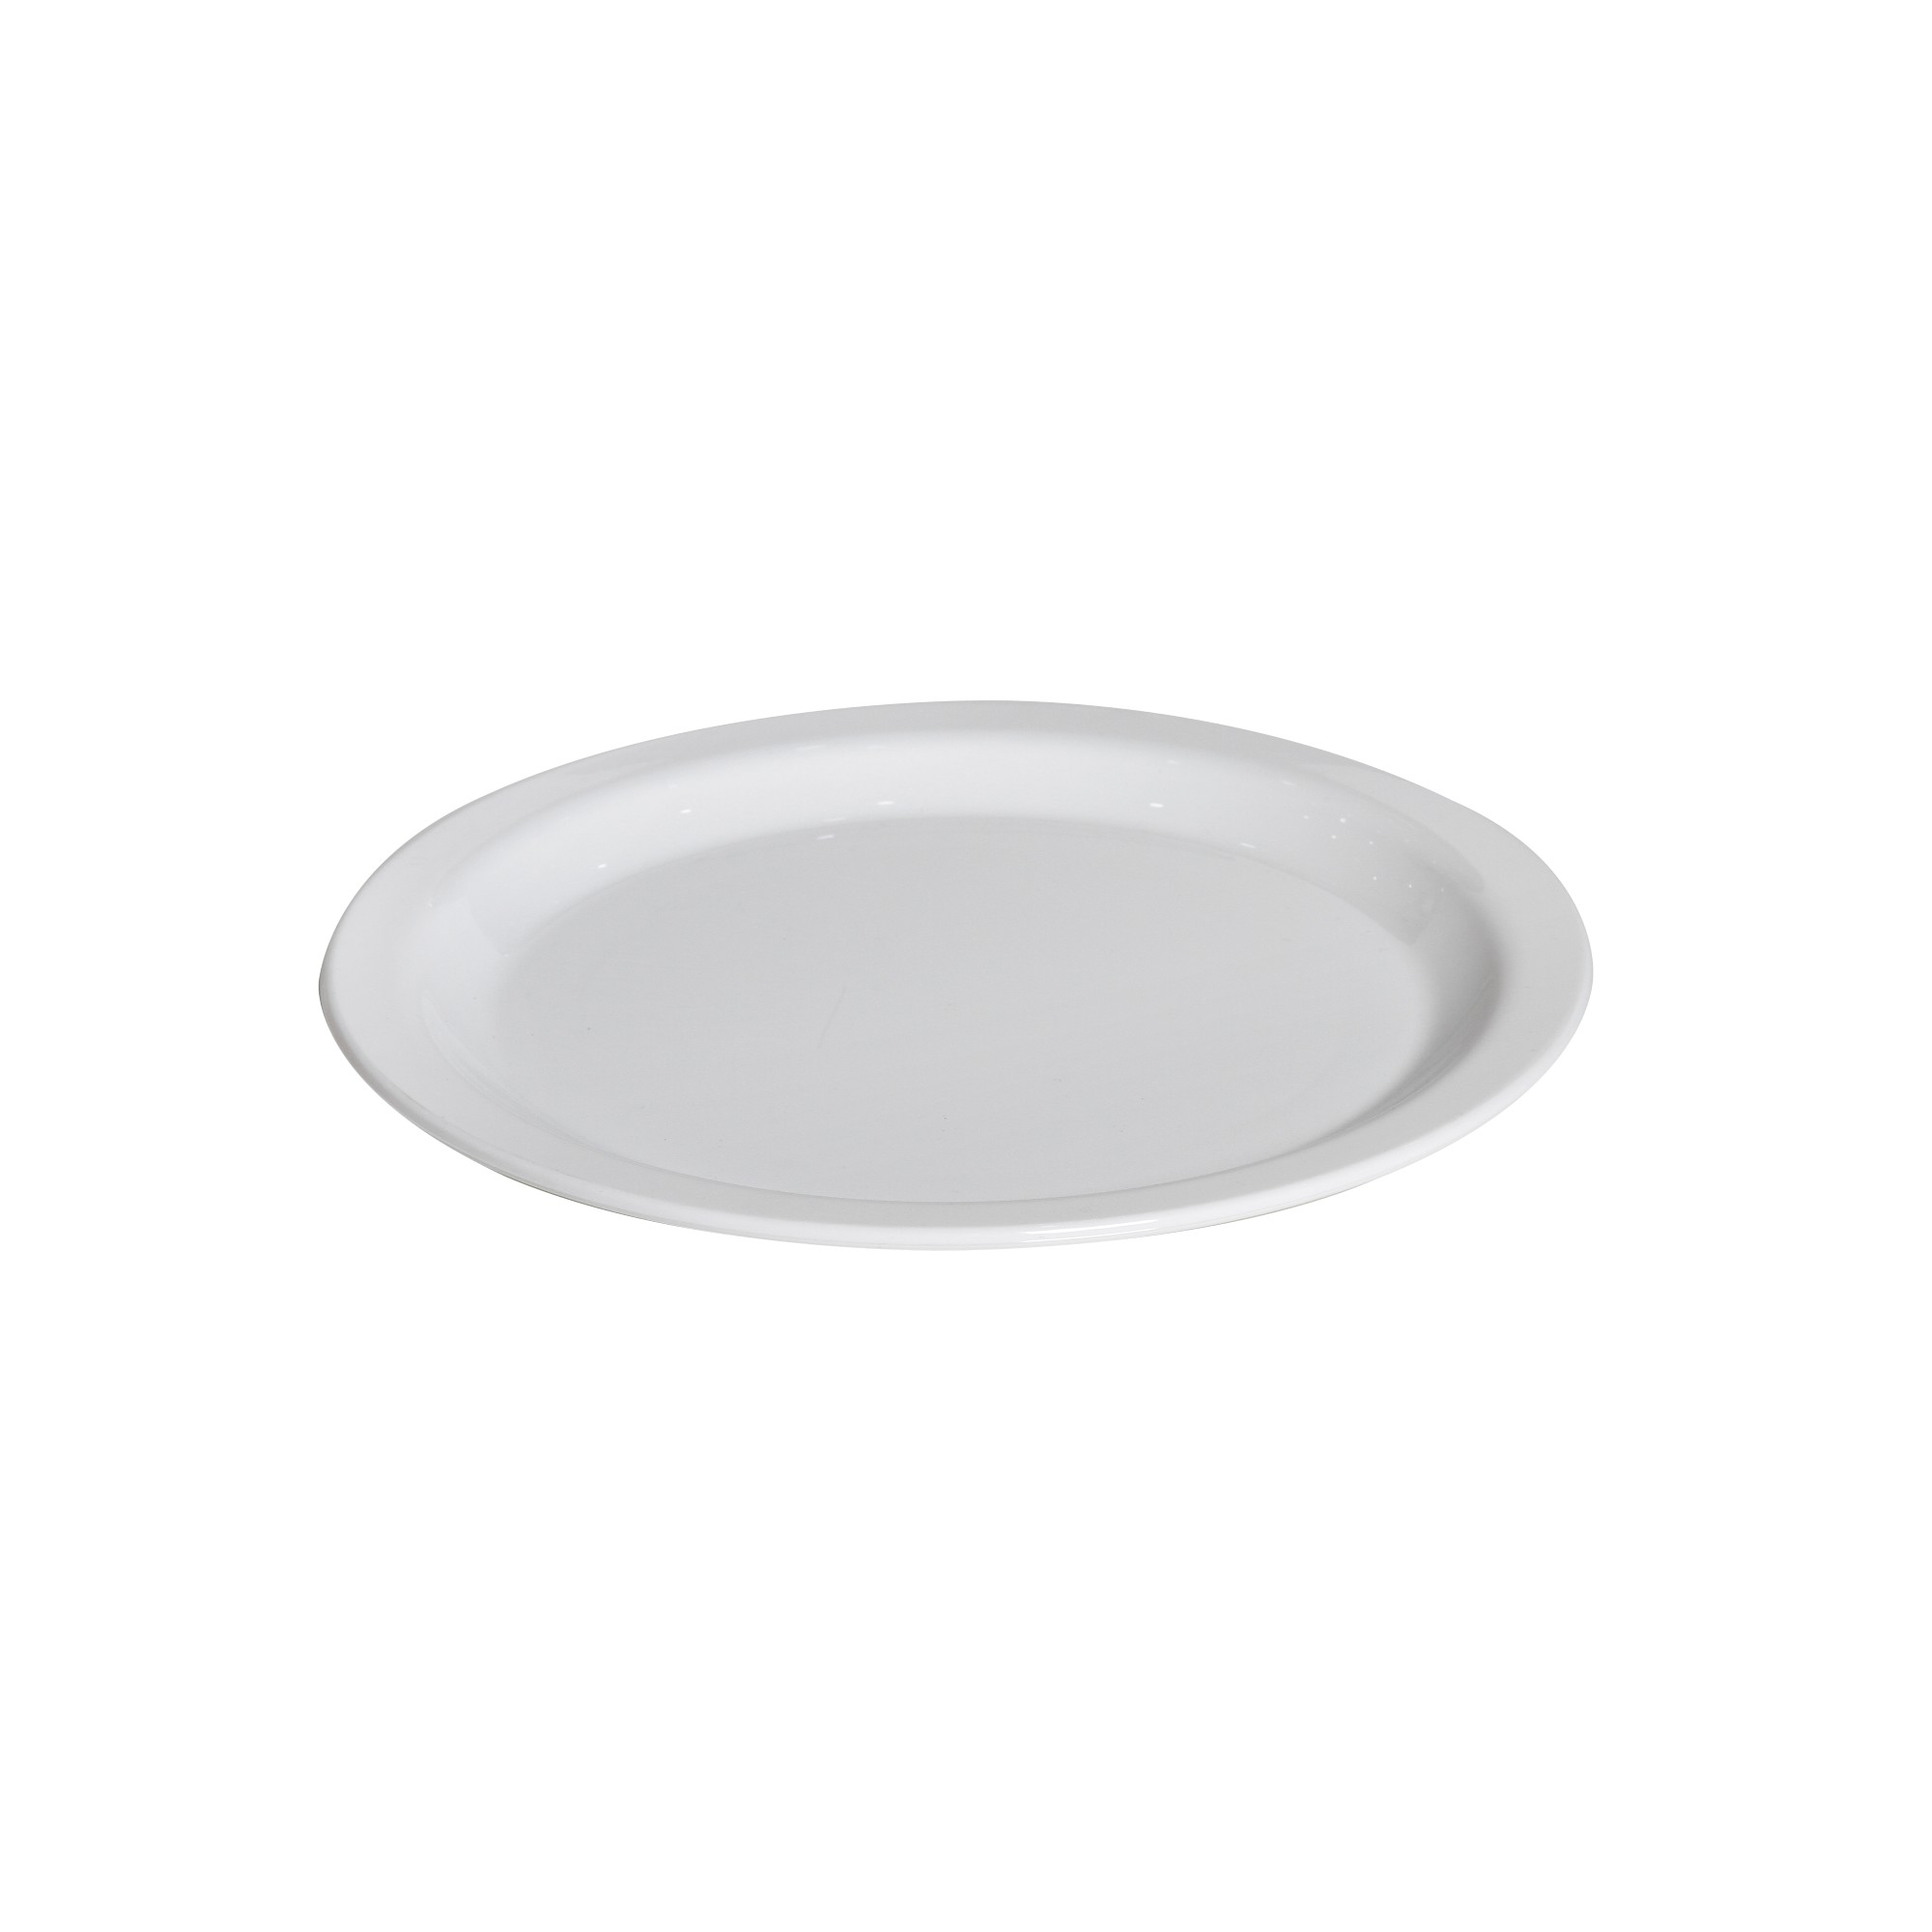 Prato de Sobremesa de Plastico 19cm - 272 - Vem Plast